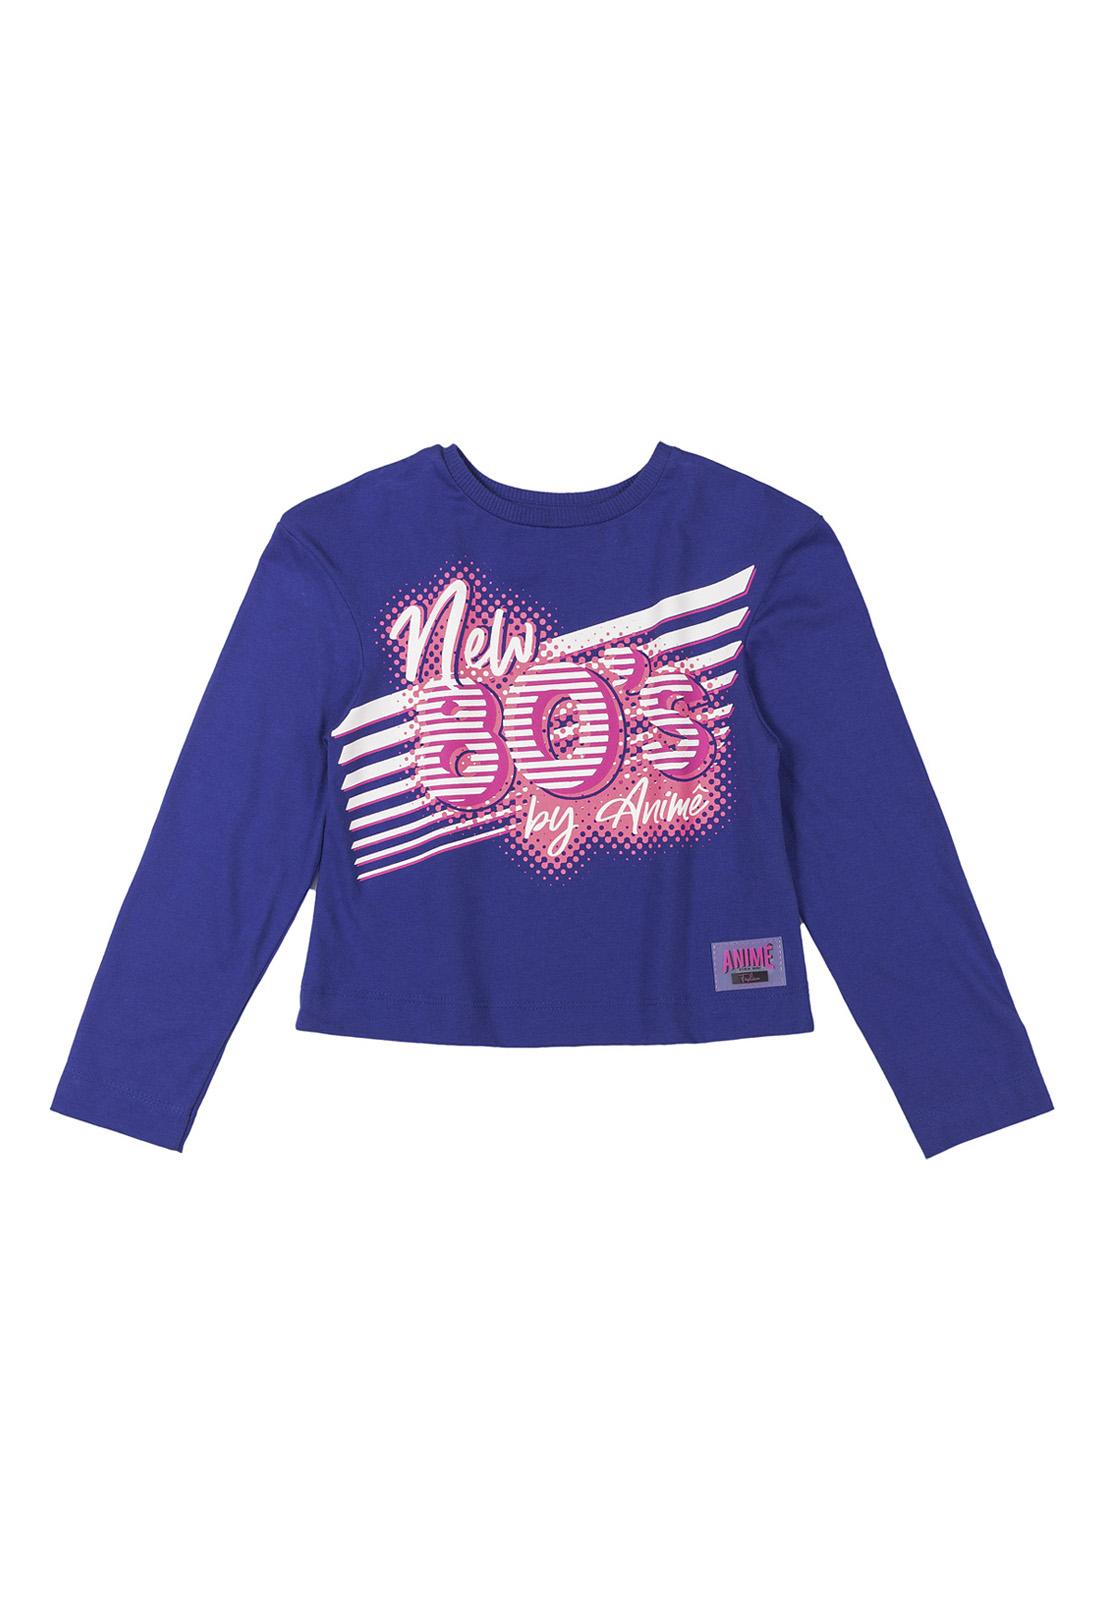 Blusa Infantil Malha Azul Royal Estampa 80s Animê